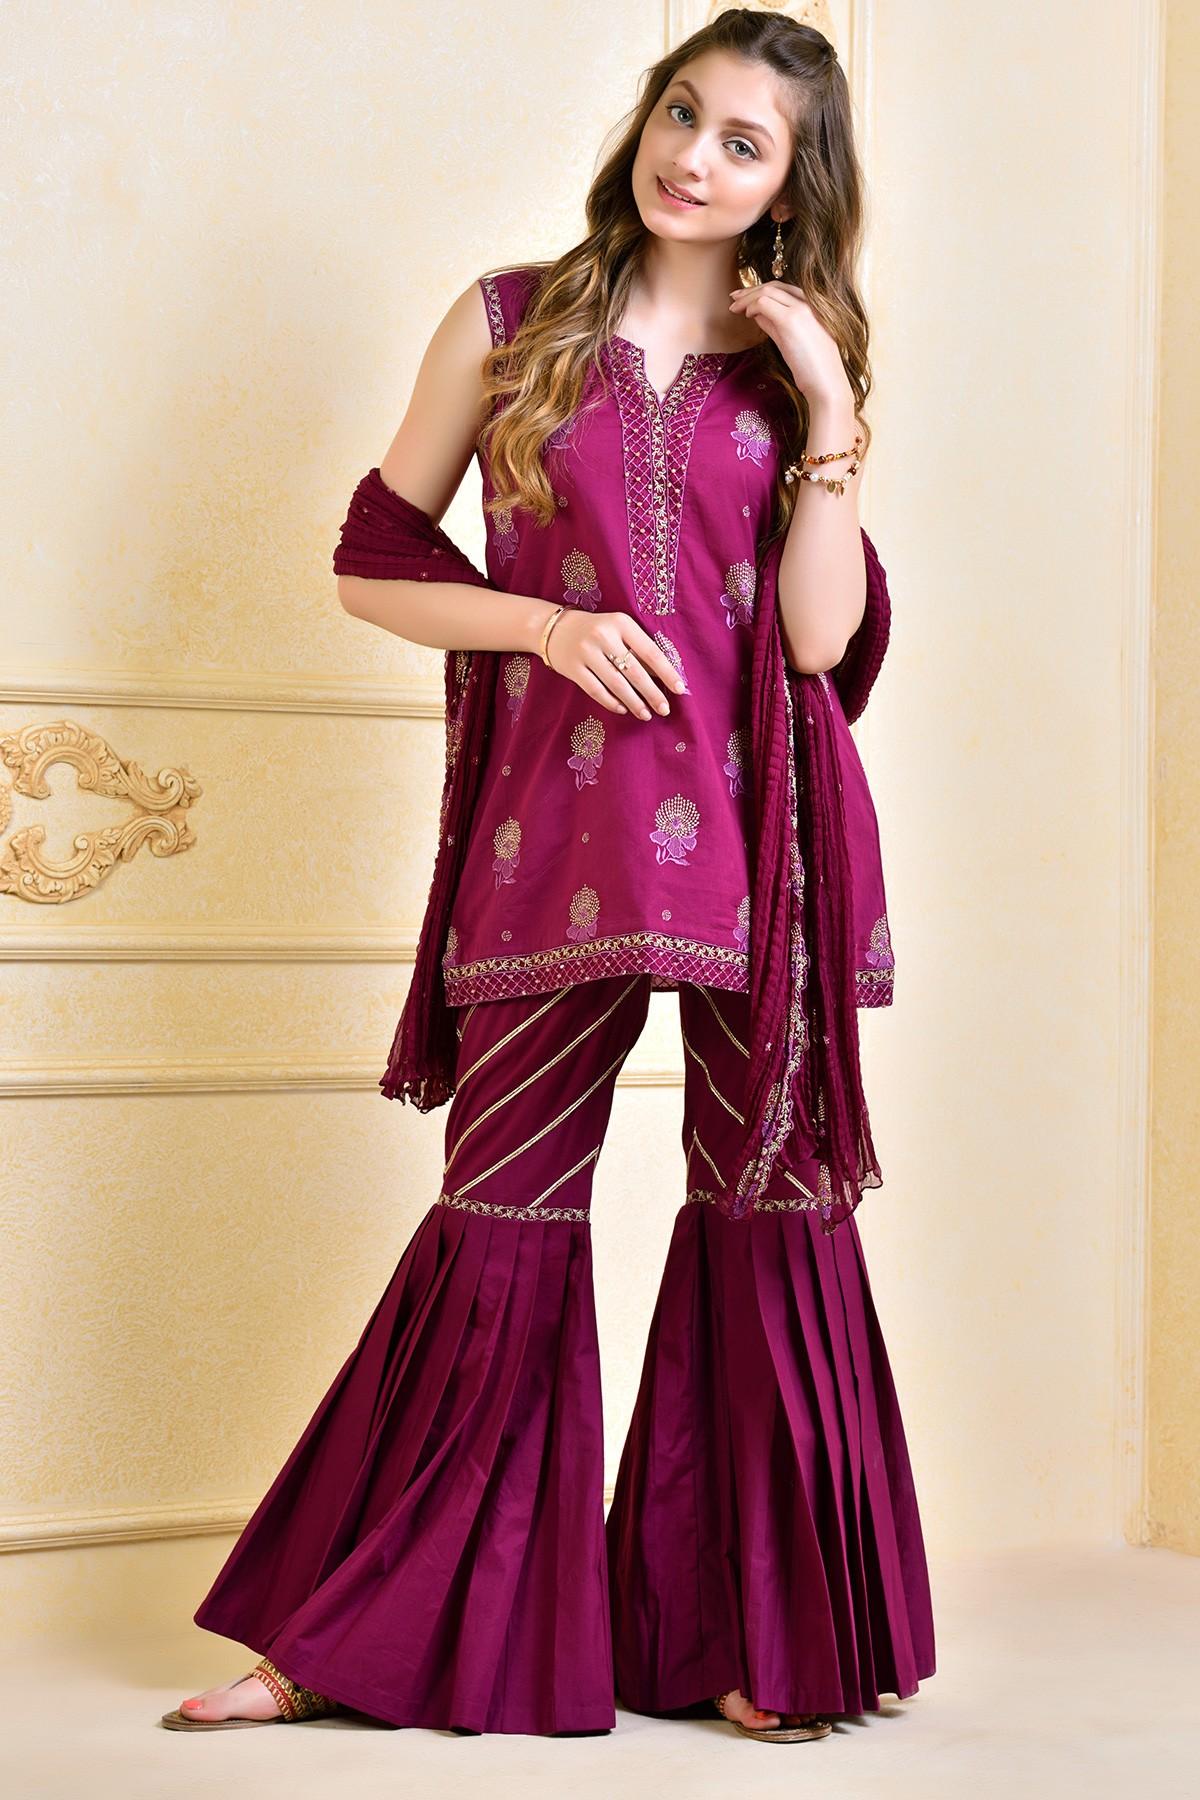 Kayseria Beautiful Fancy Eid Dresses Collection 2017-2018 (14)